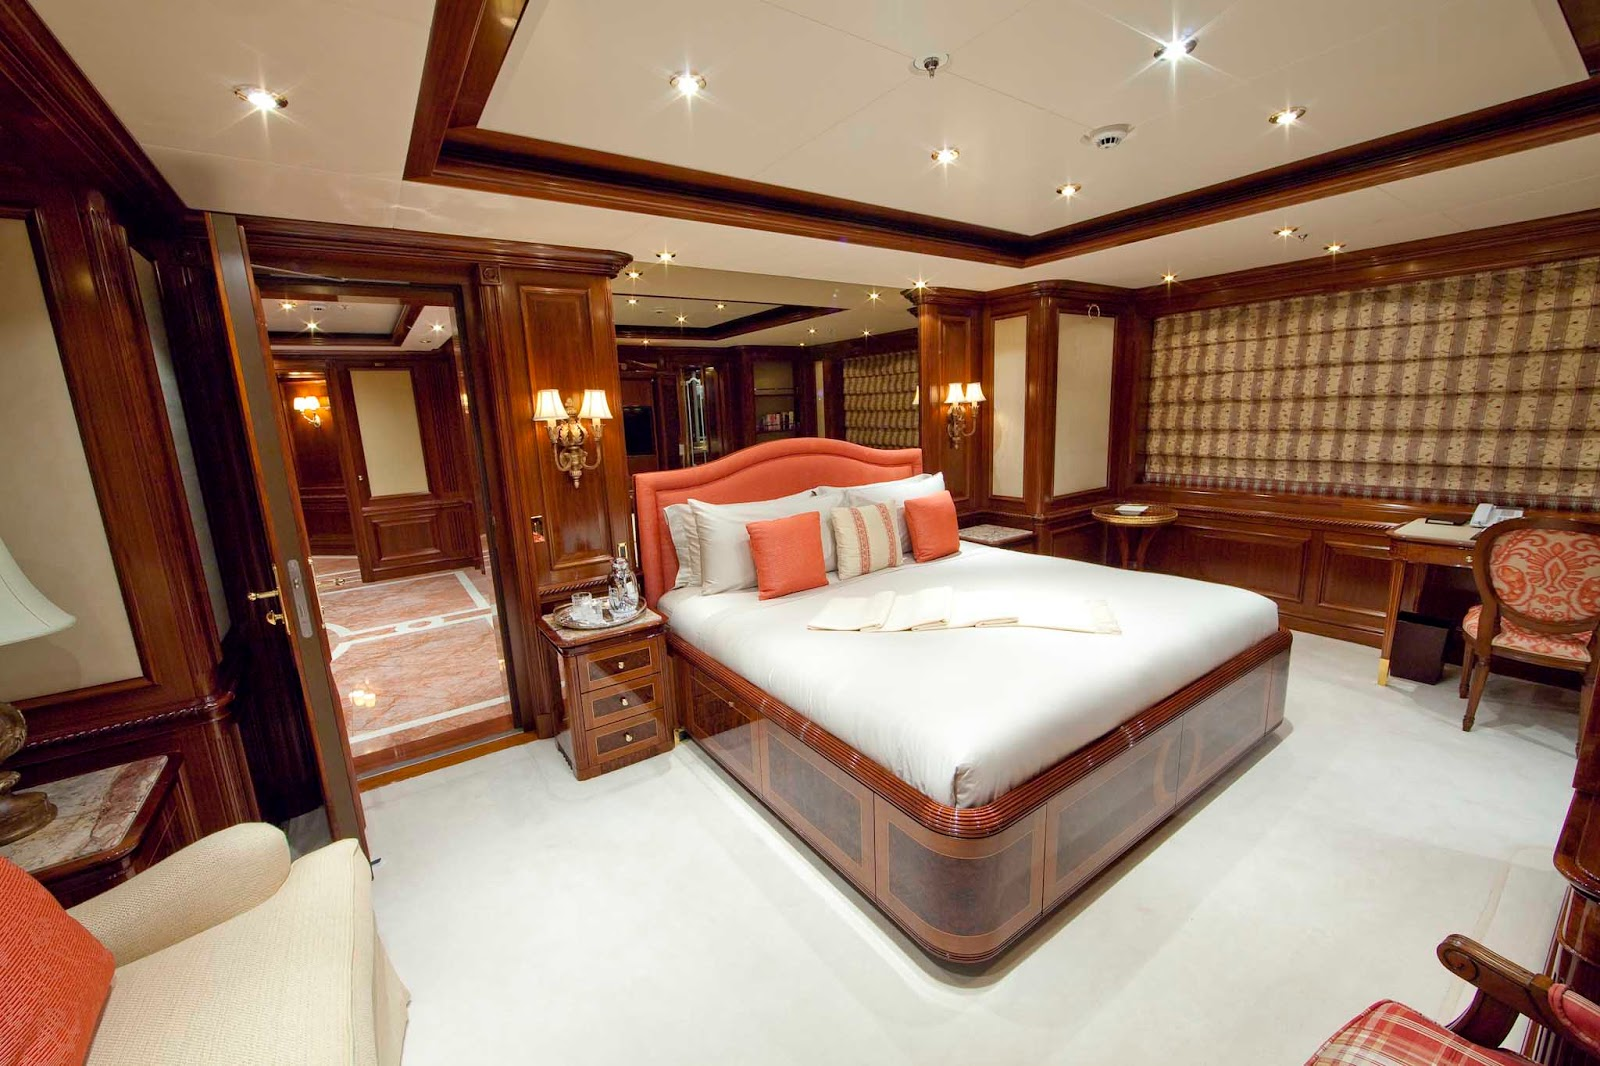 GOLDEN ODYSSEY Superyacht Guest Room 2